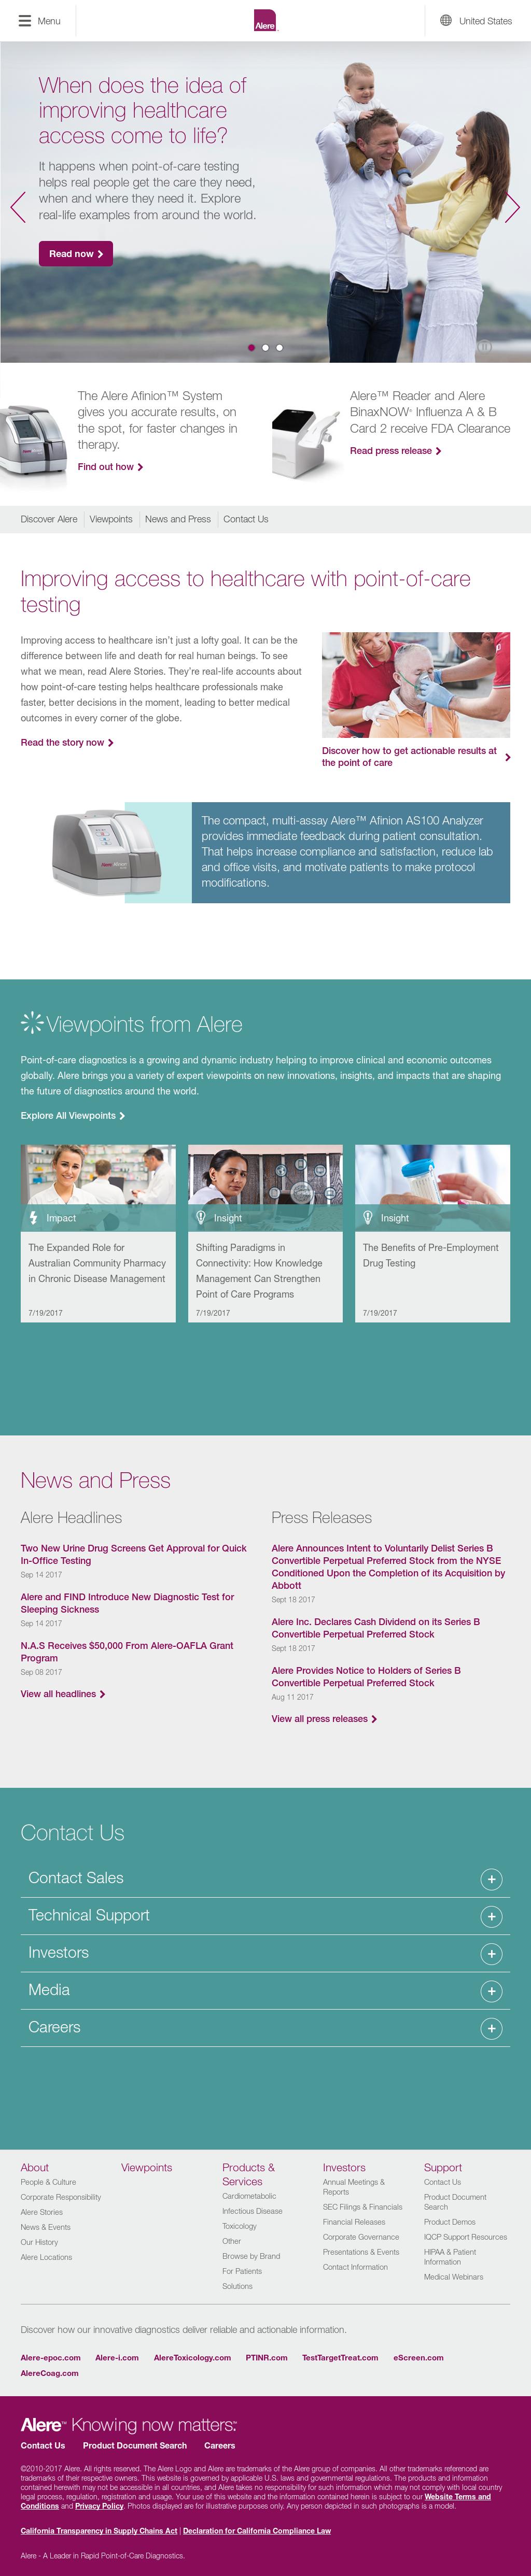 Alere Competitors, Revenue and Employees - Owler Company Profile